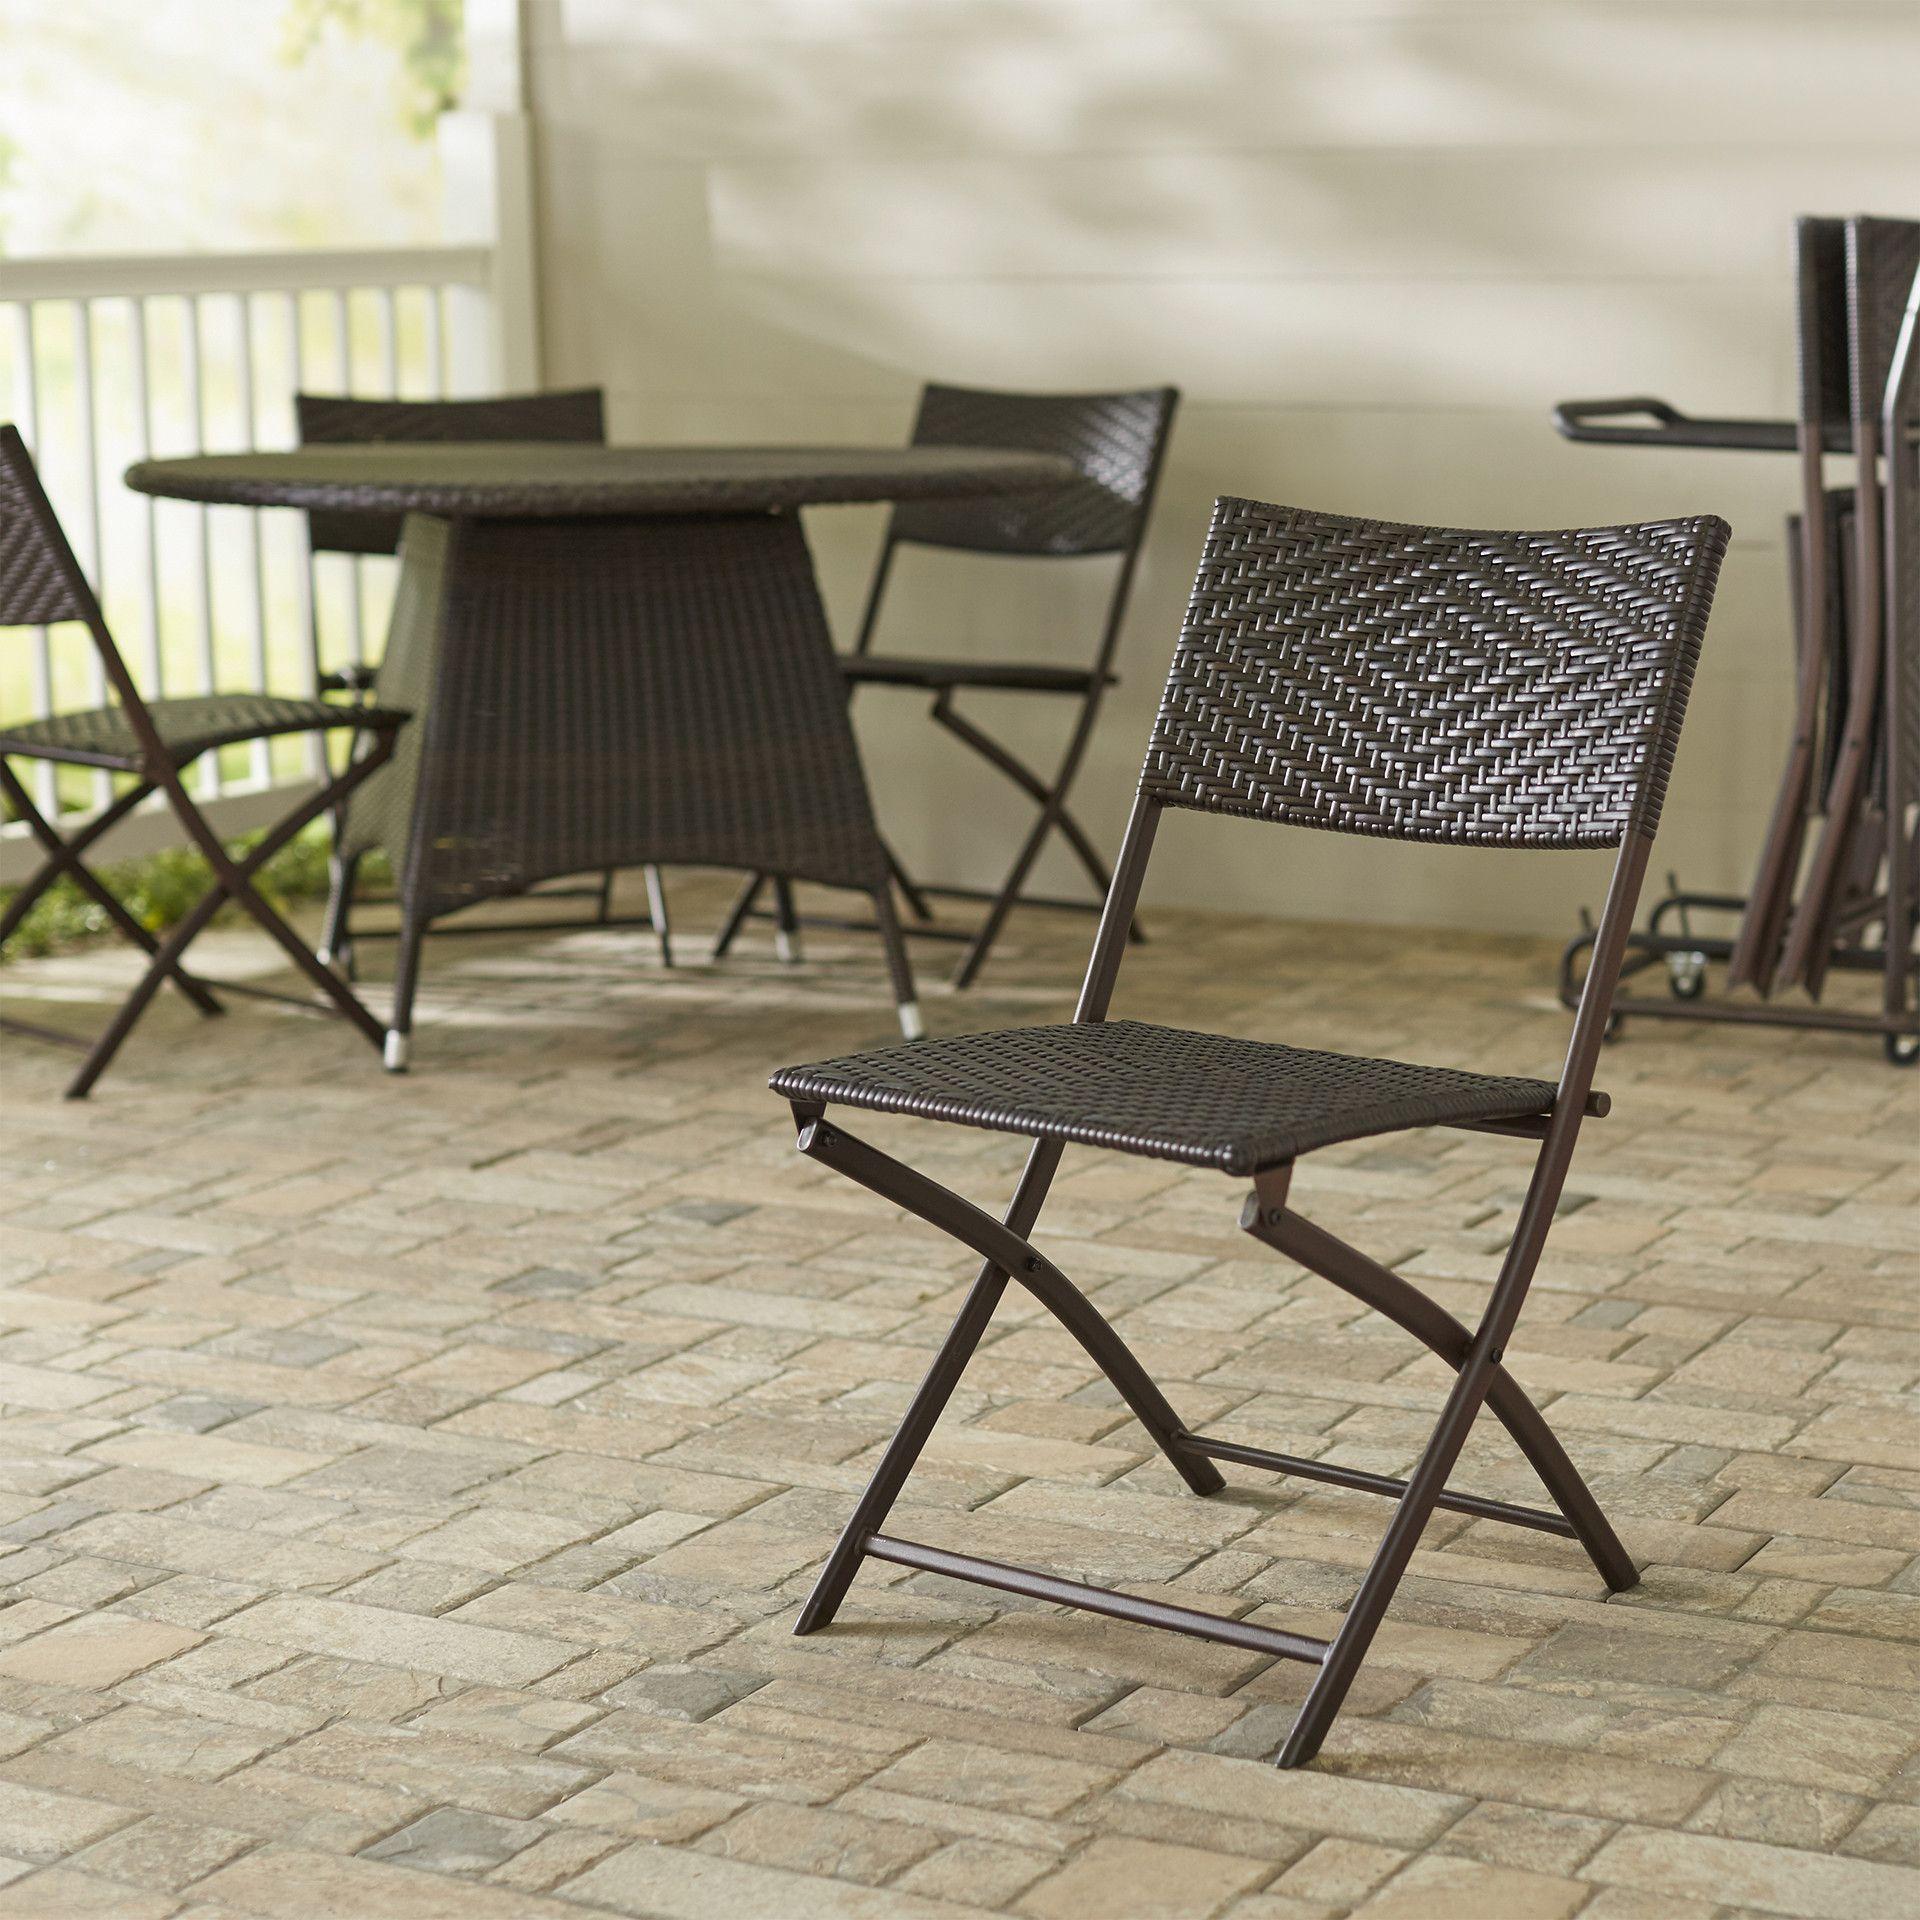 northridge patio dining chair products patio dining chairs rh pinterest com au